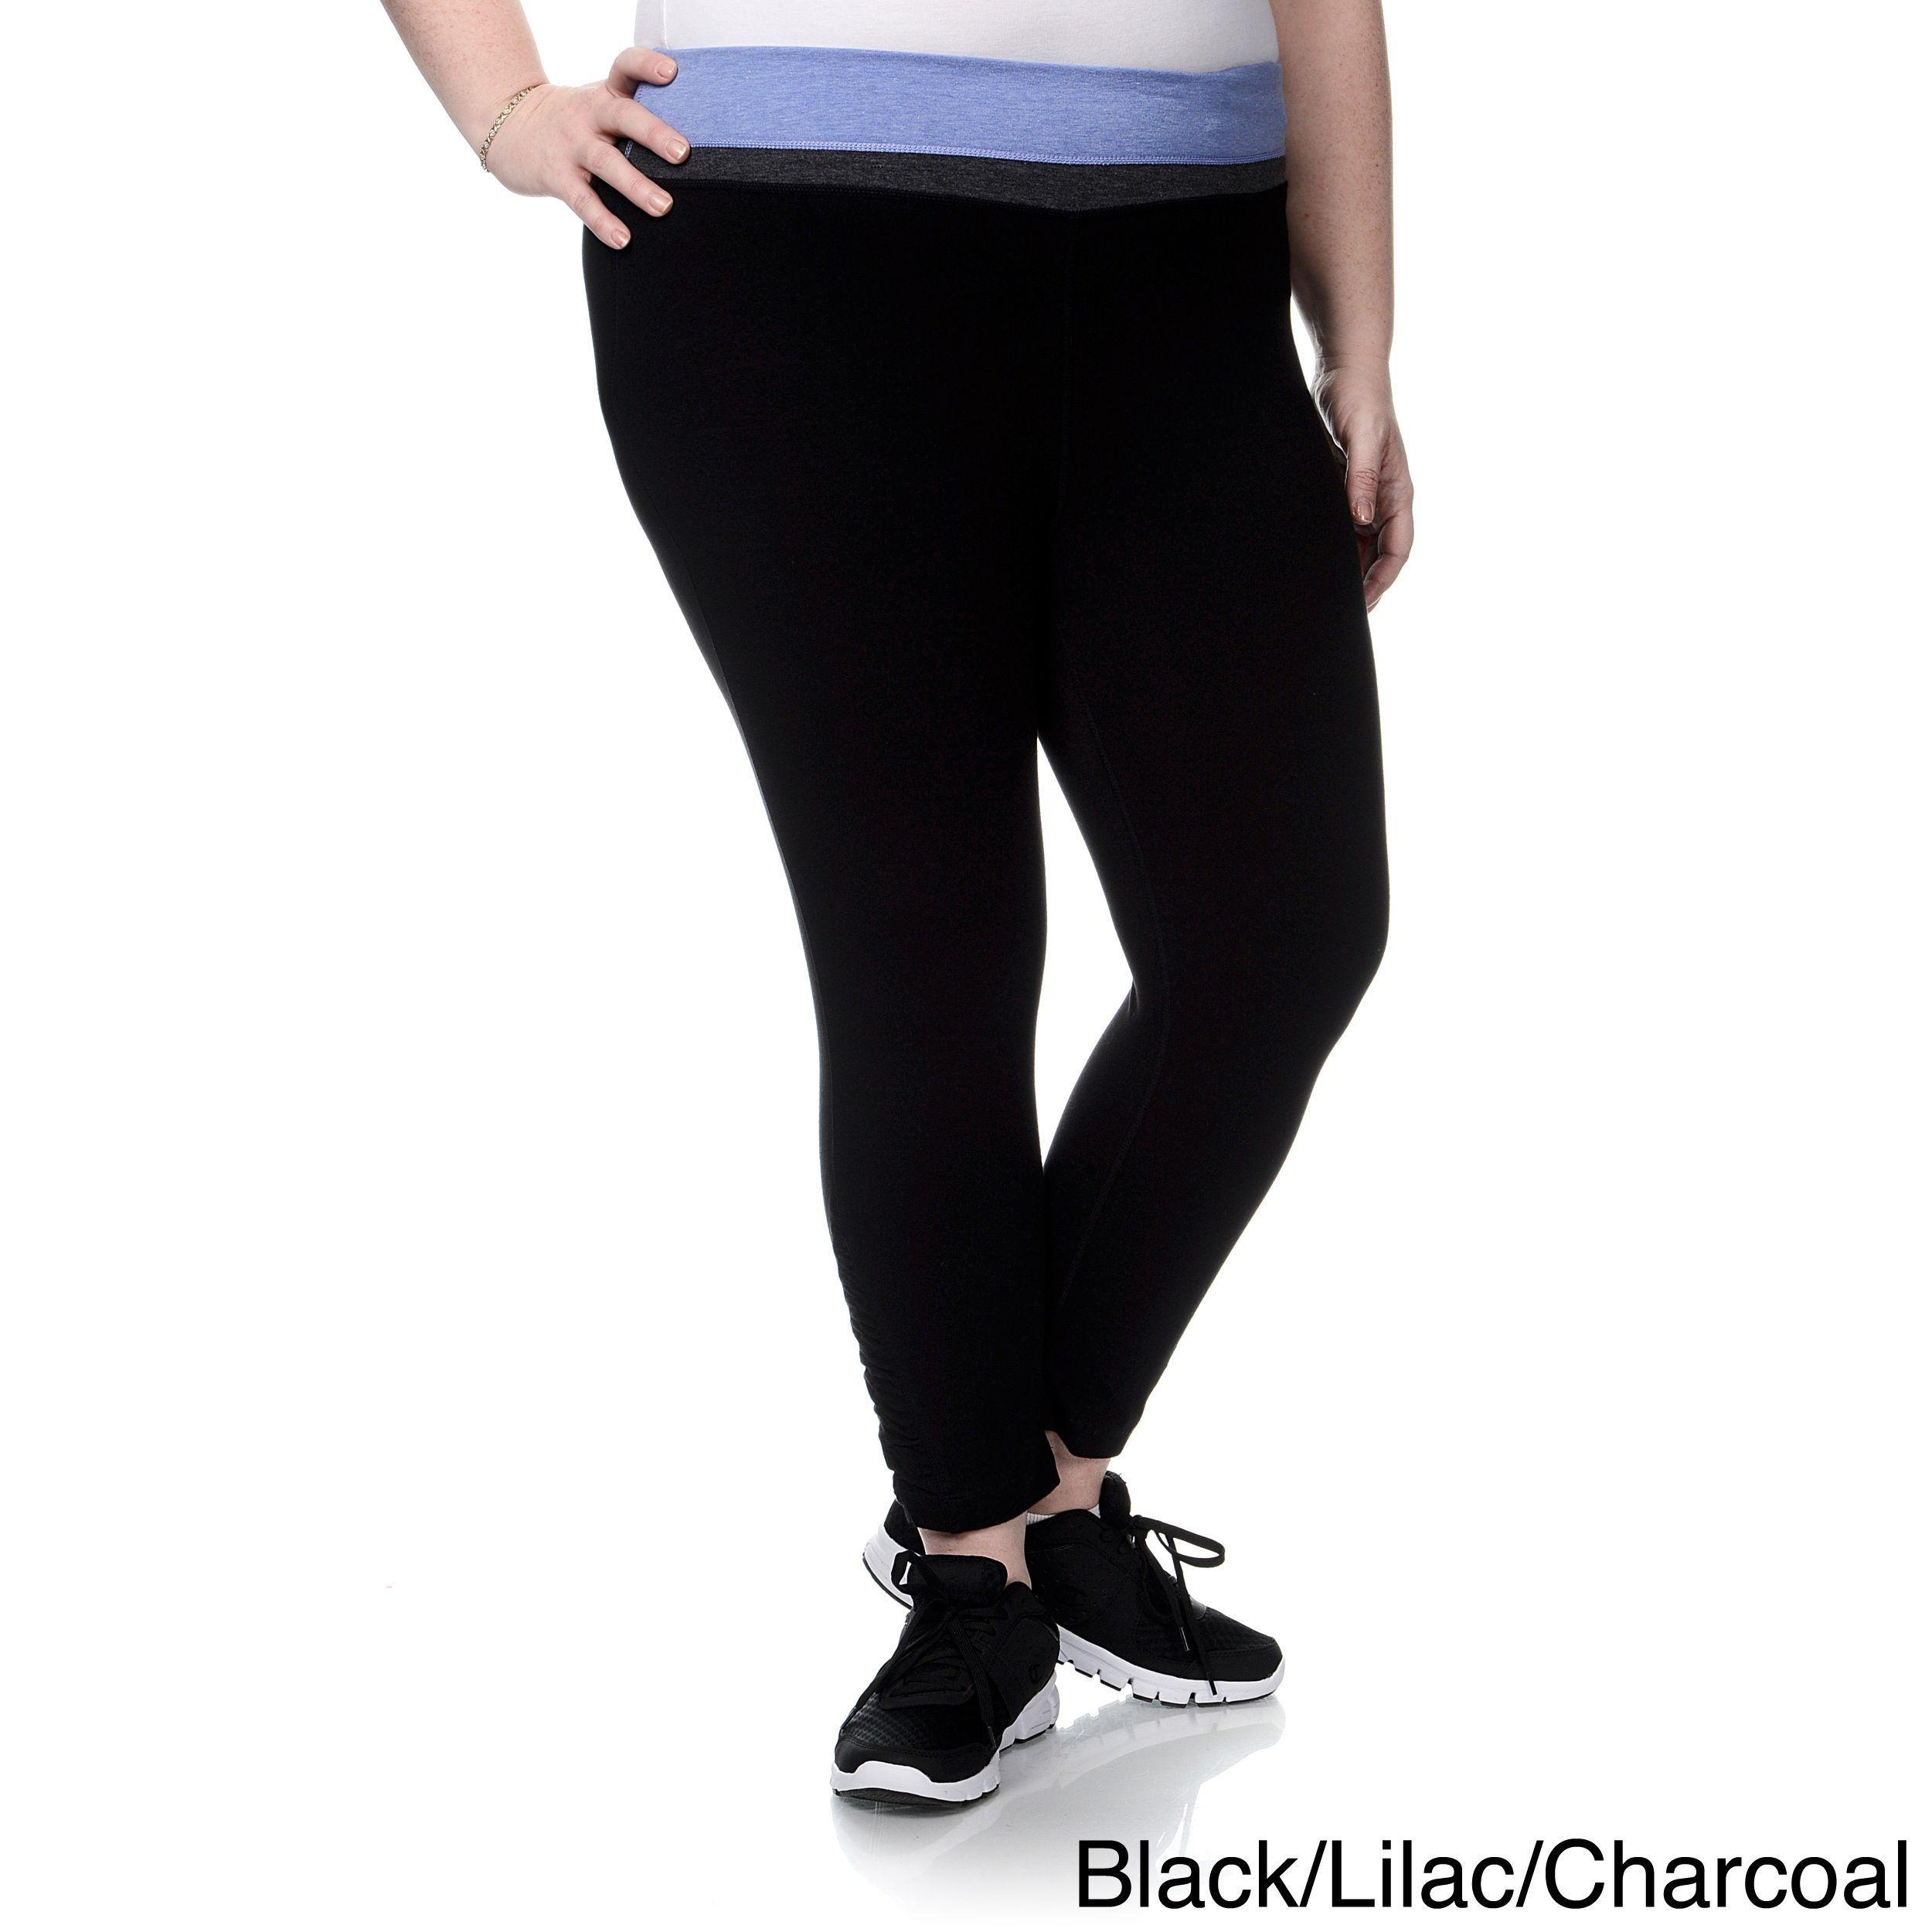 d2f5da61f0982 Chloe 90 Degree by Reflex Women's Plus Size Shirred Leg Yoga Capri Pants